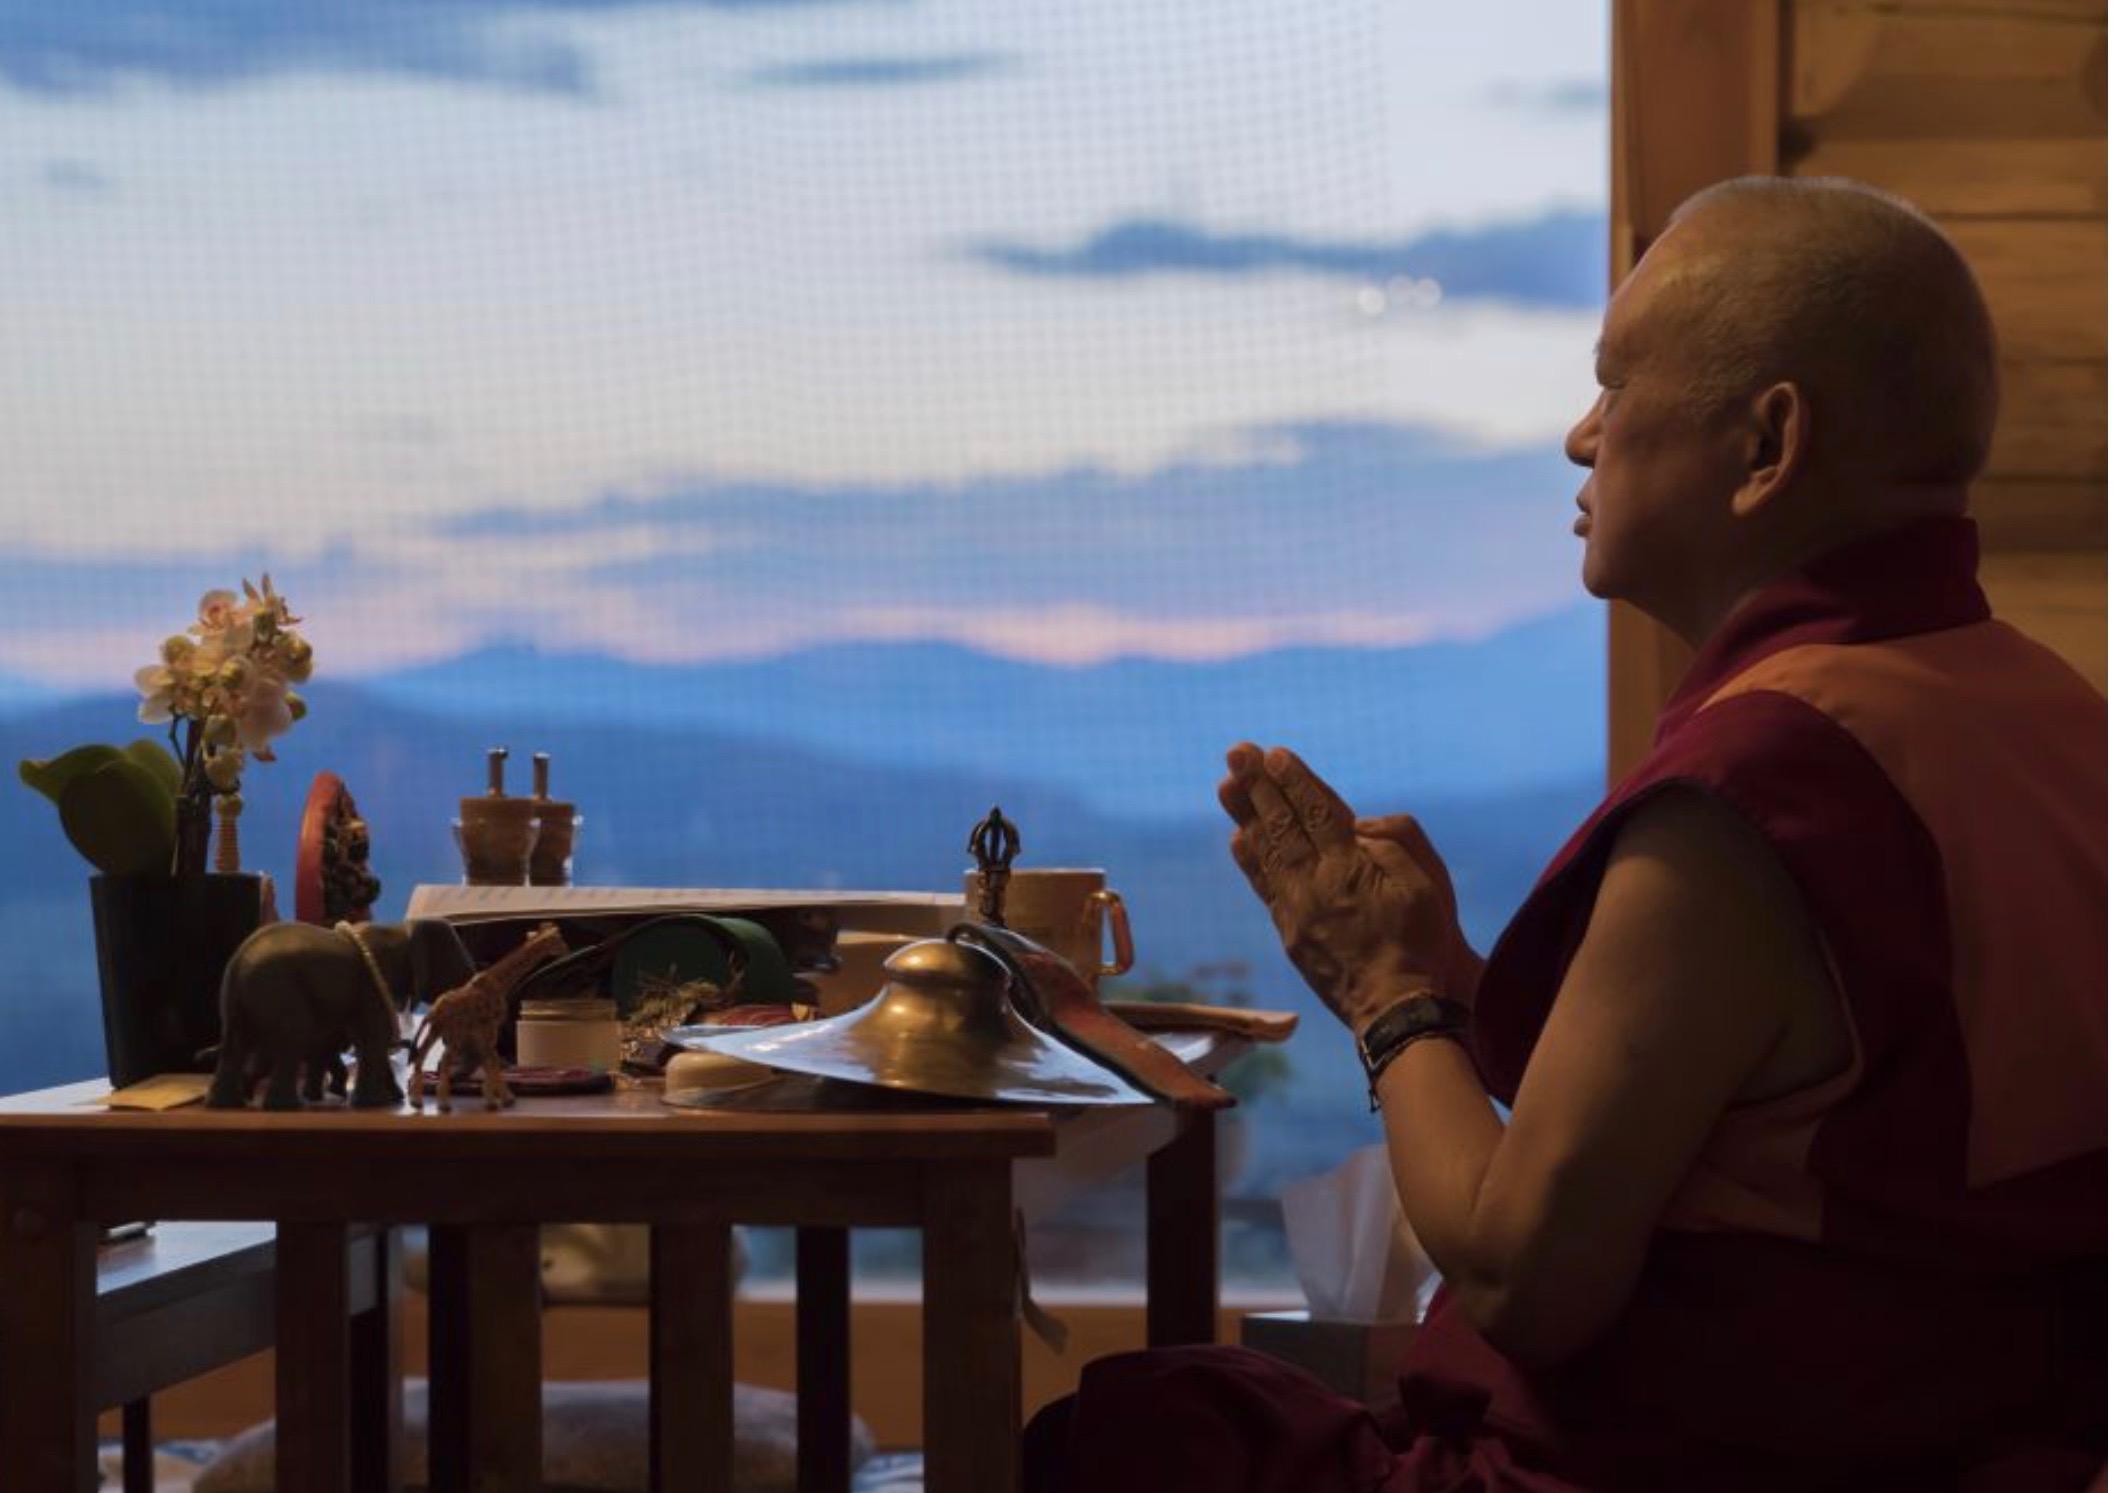 Lama Zopa Rinpoche doing prayers at Buddha Amitabha Pure Land, Washington, USA, 2018. (Photo Ven Losang Sherab)